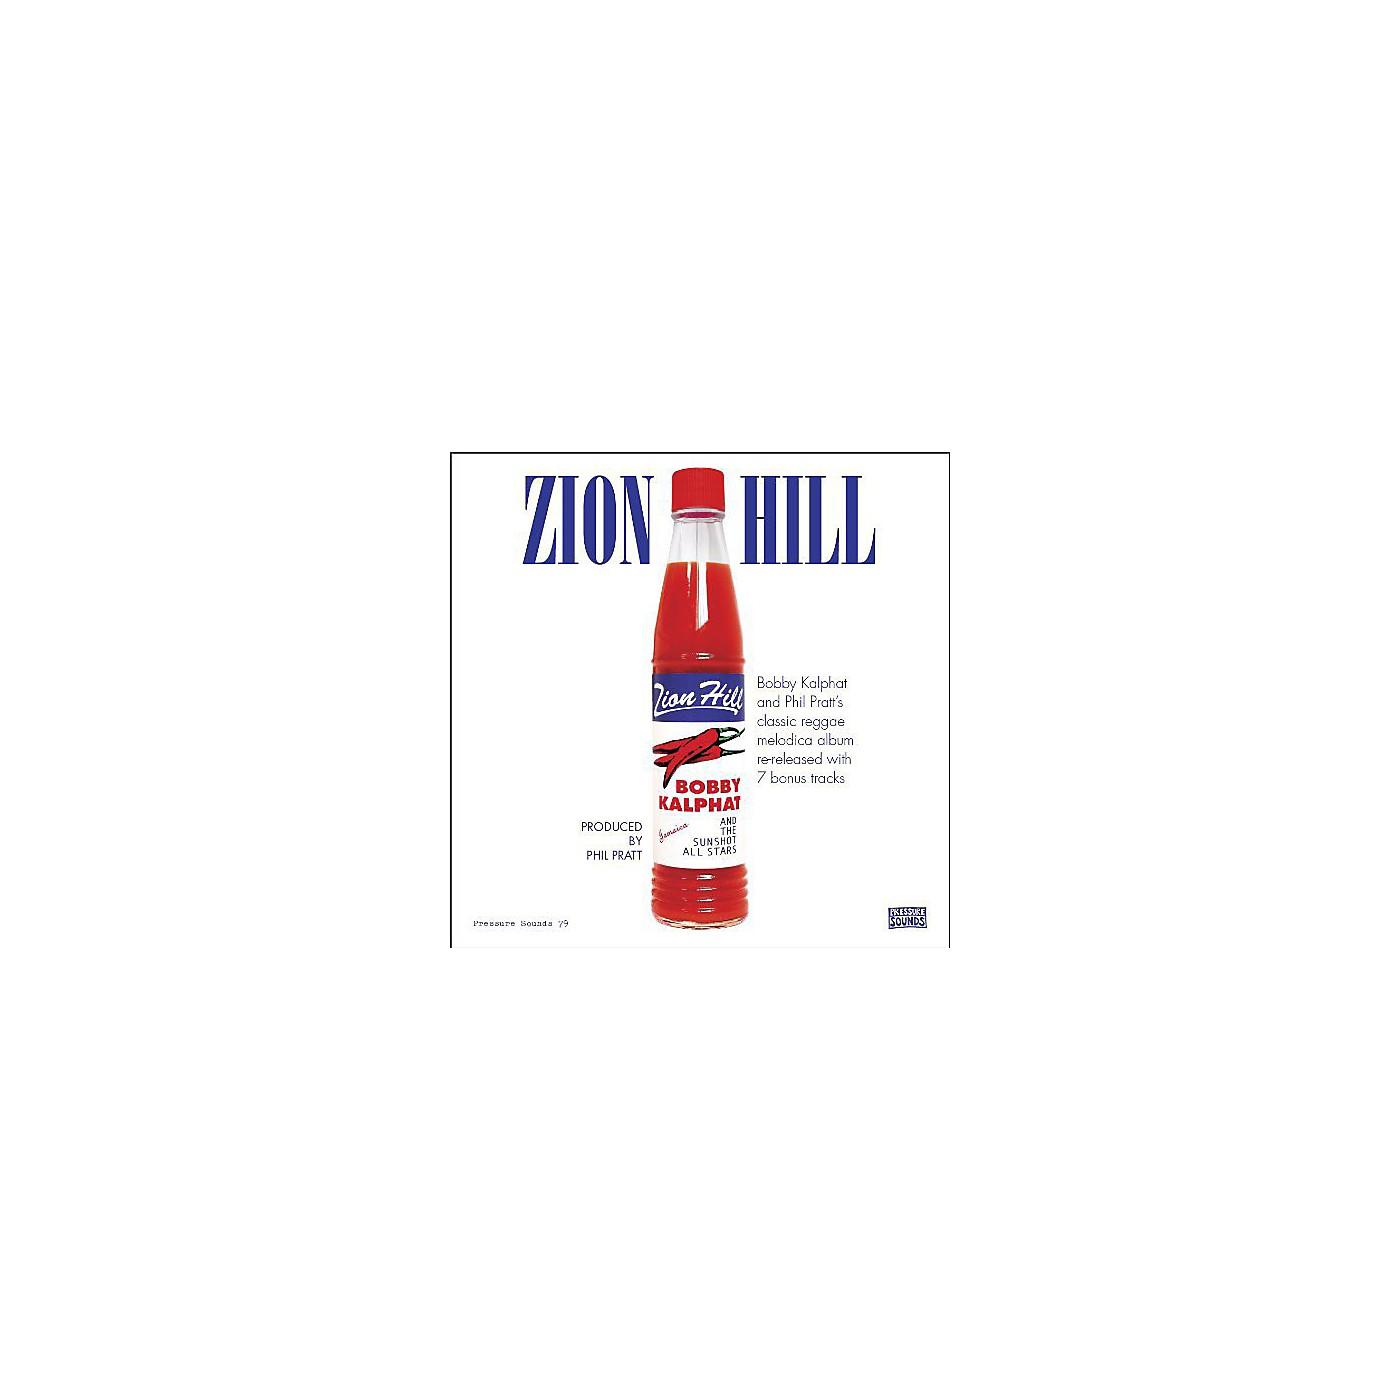 Alliance Bobby Kalphat & the Sunshot All Stars - Zion Hill thumbnail